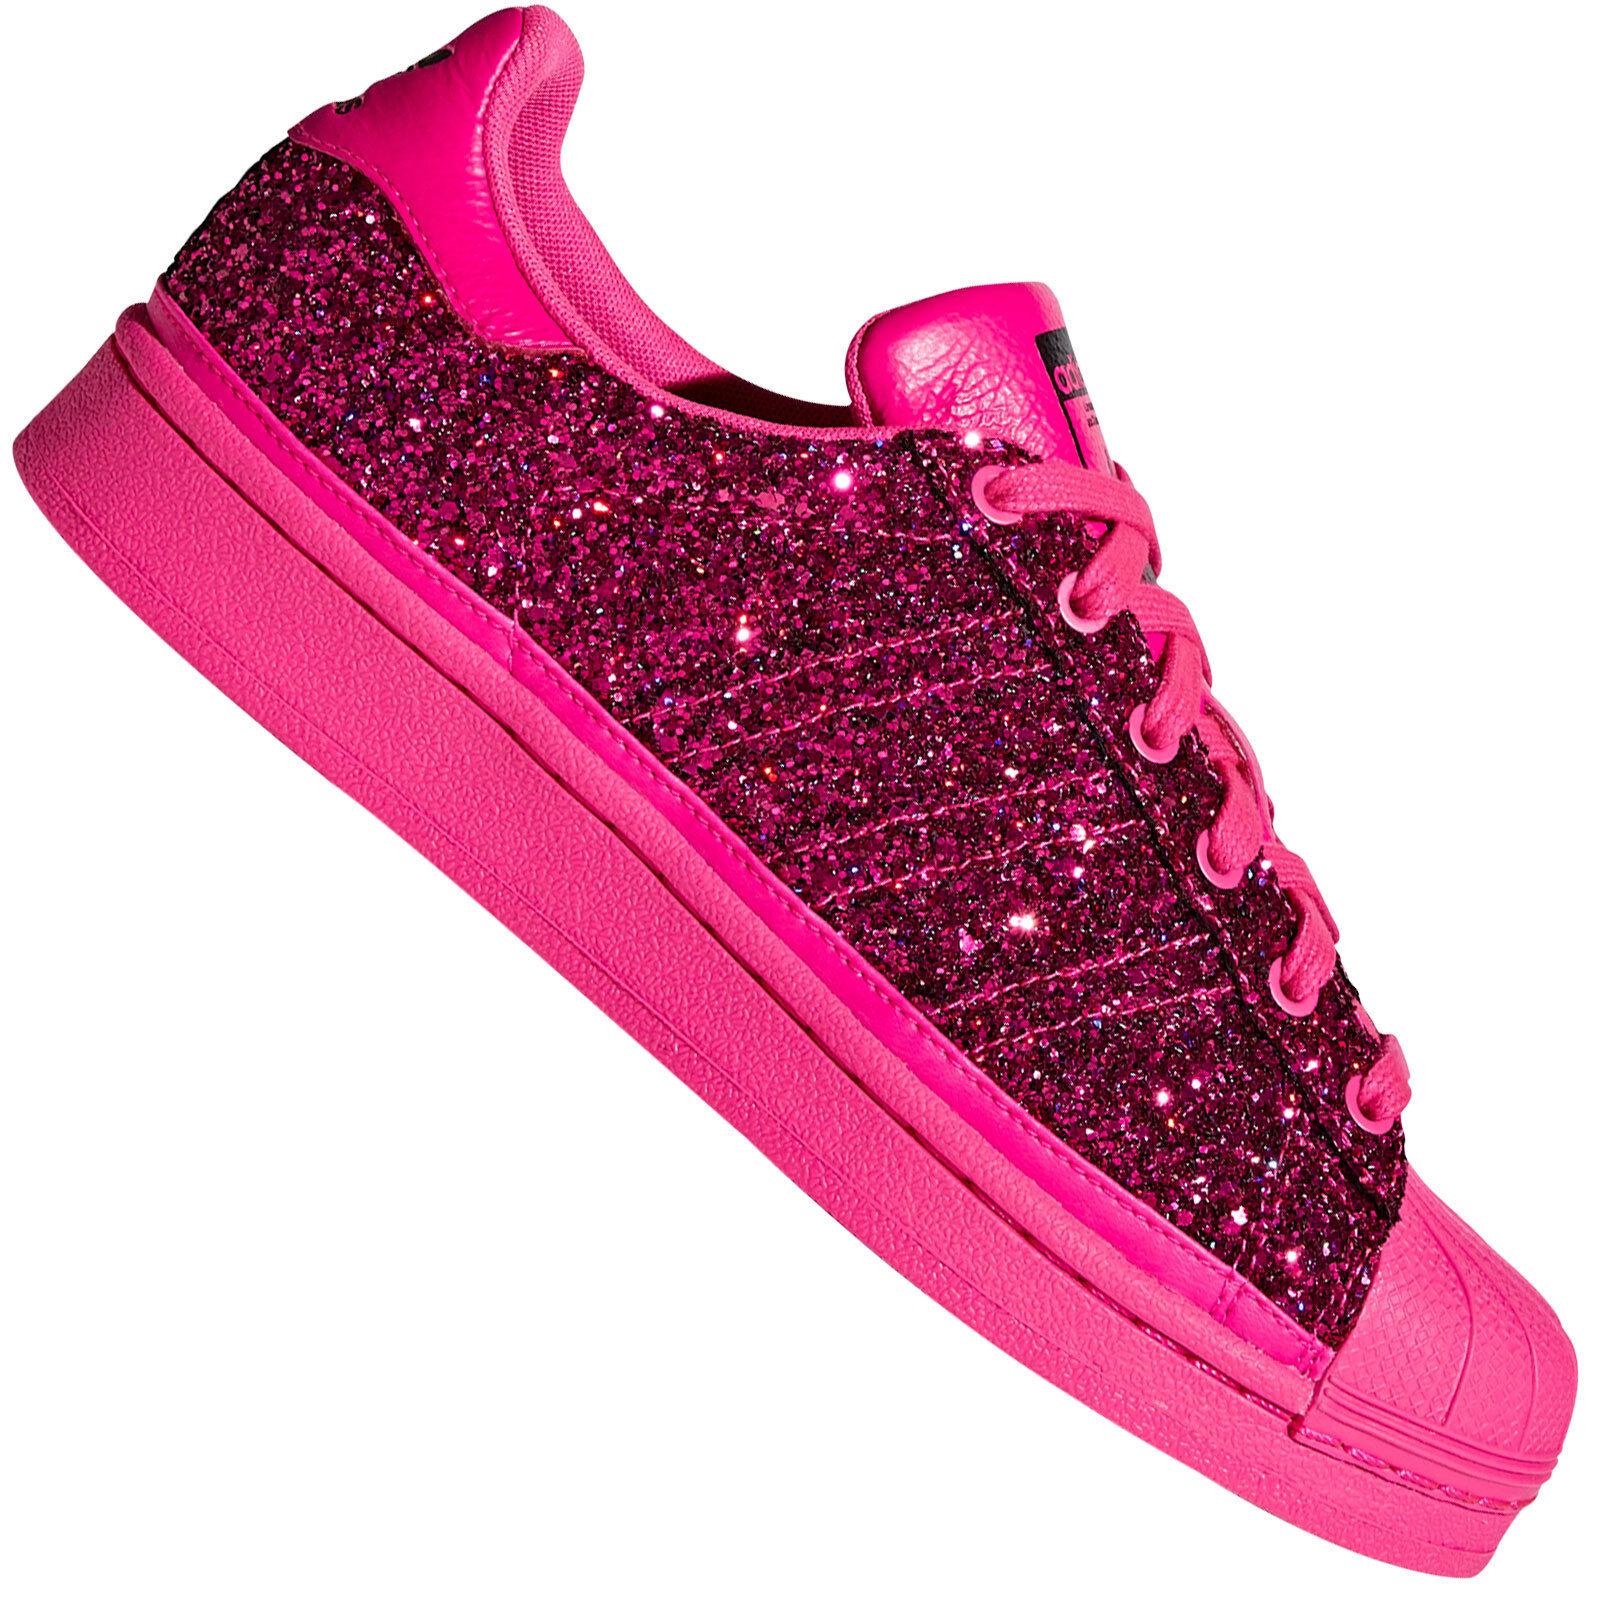 Adidas Originals Superstar baskets Femmes Chaussures De Sport bd8054 paillettes rose